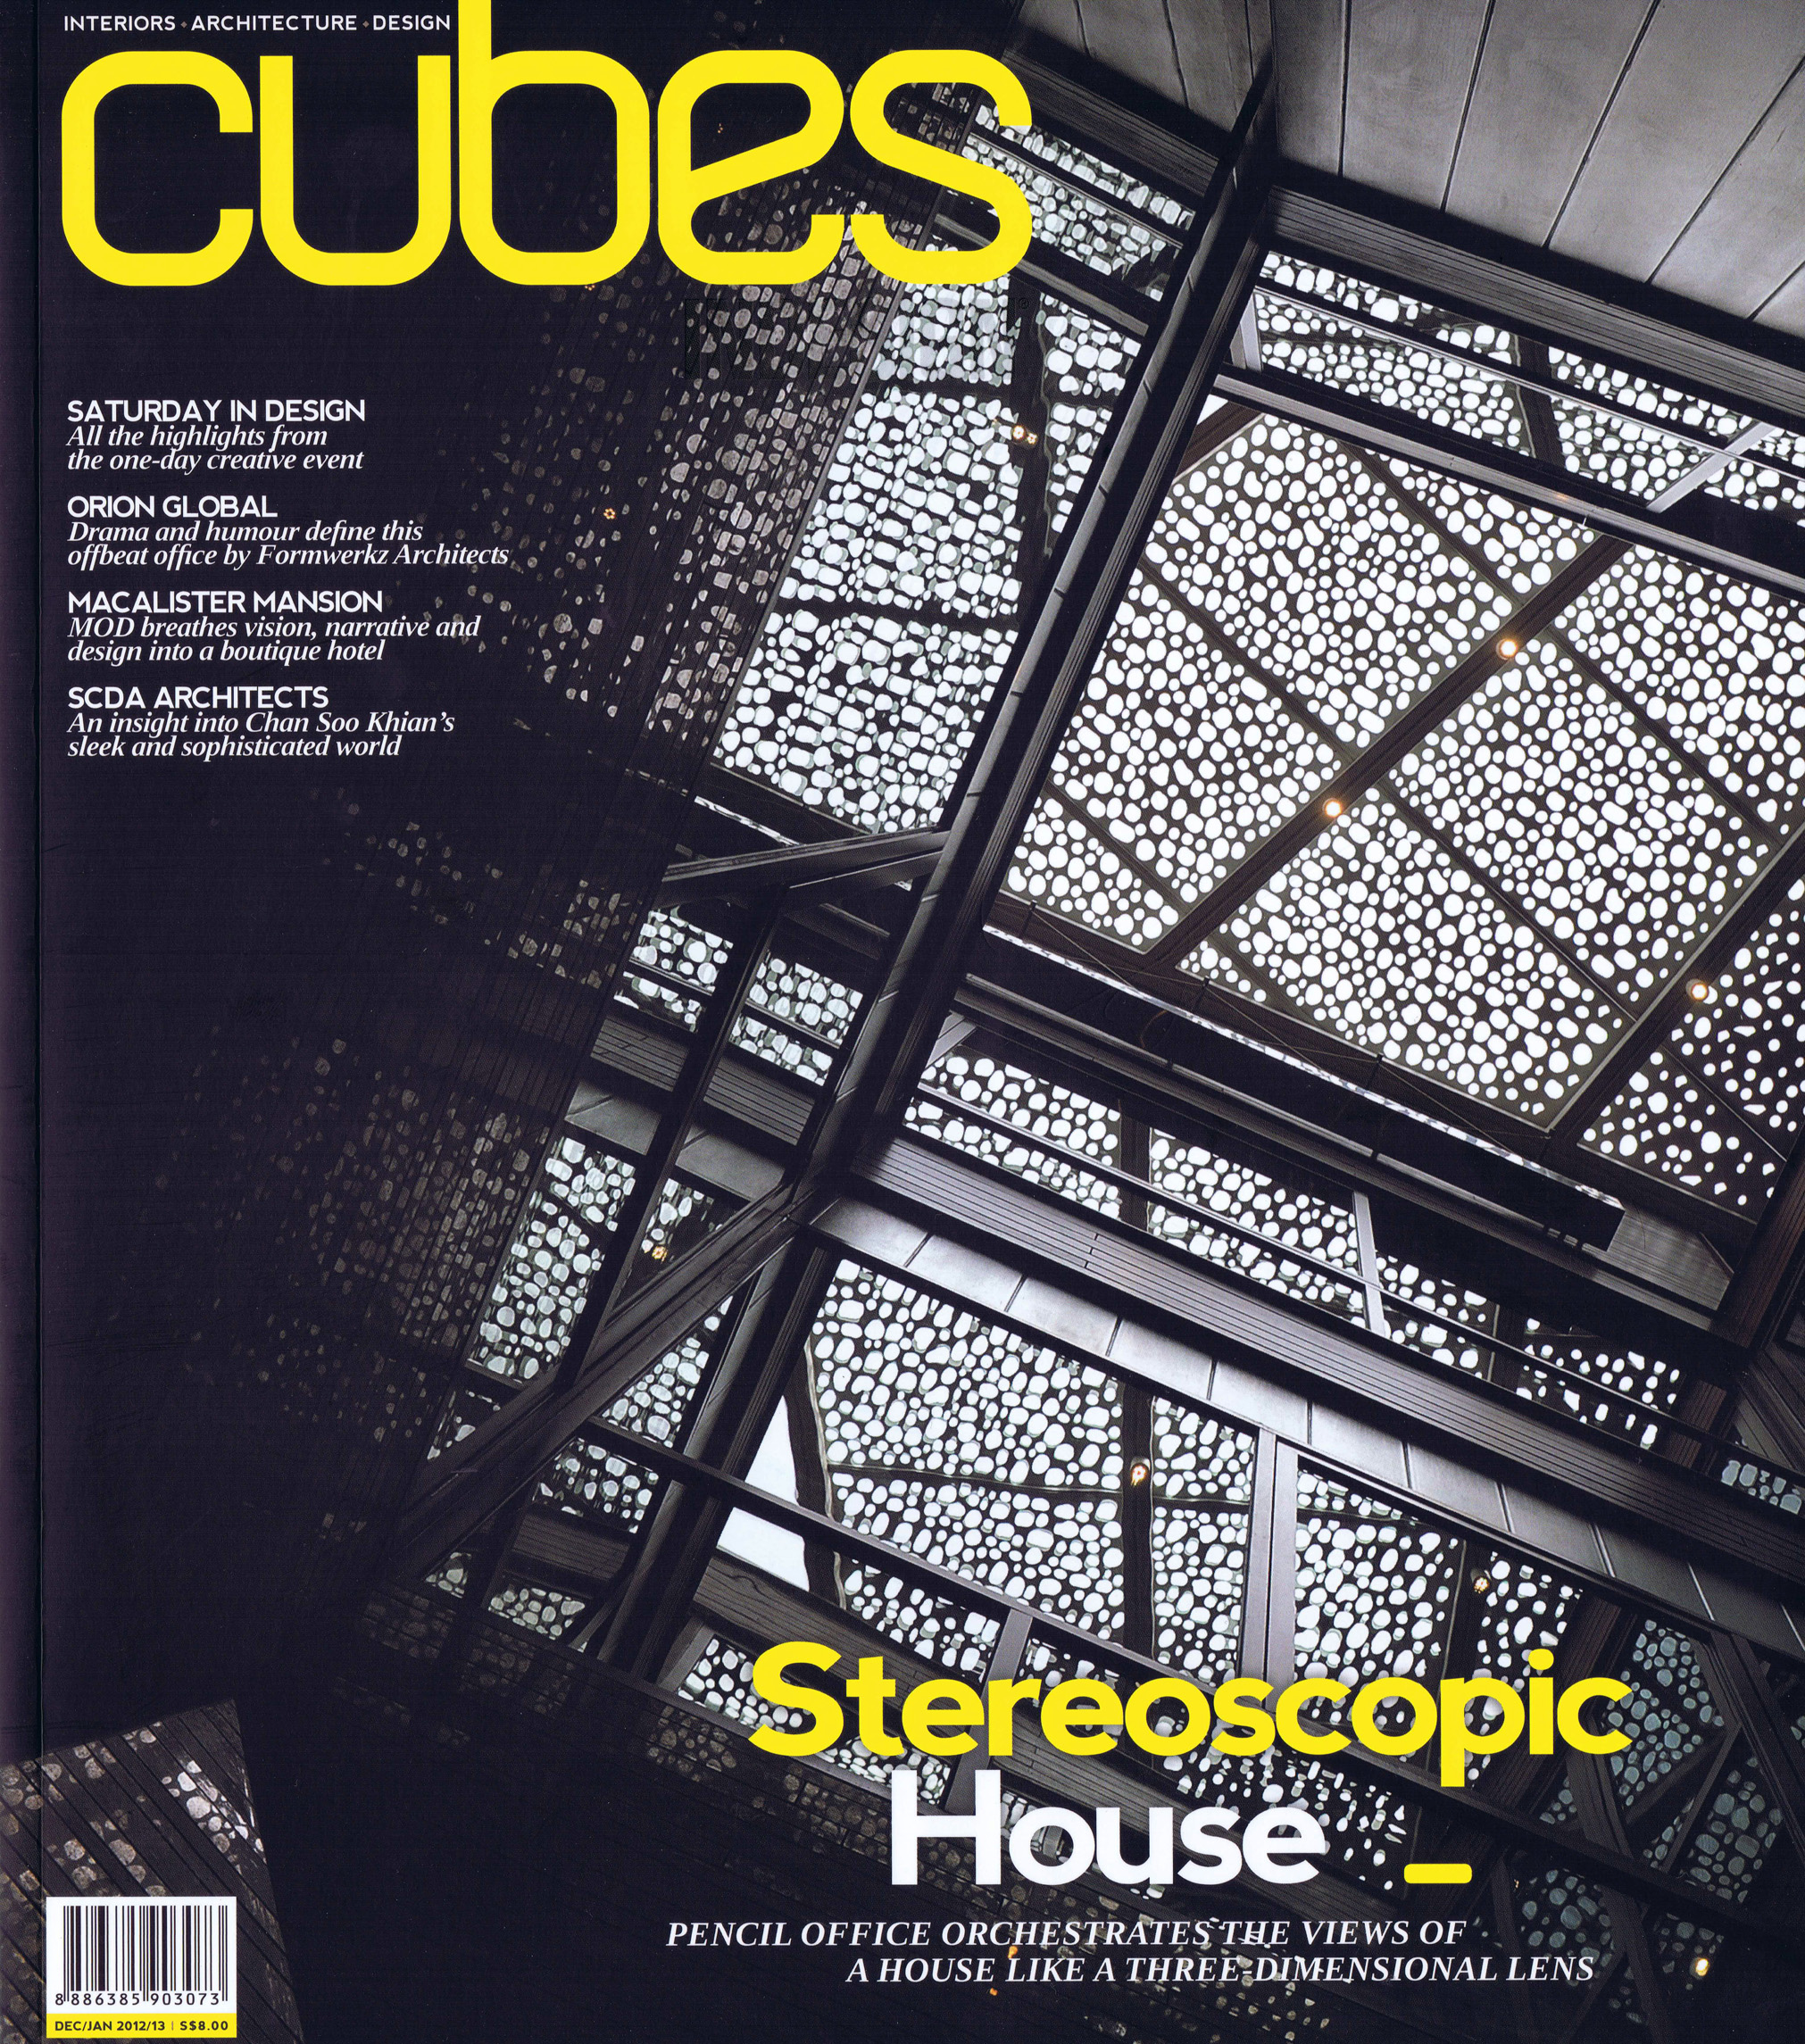 Cubes_2012_DecemberJanuary_Cover_small.jpg